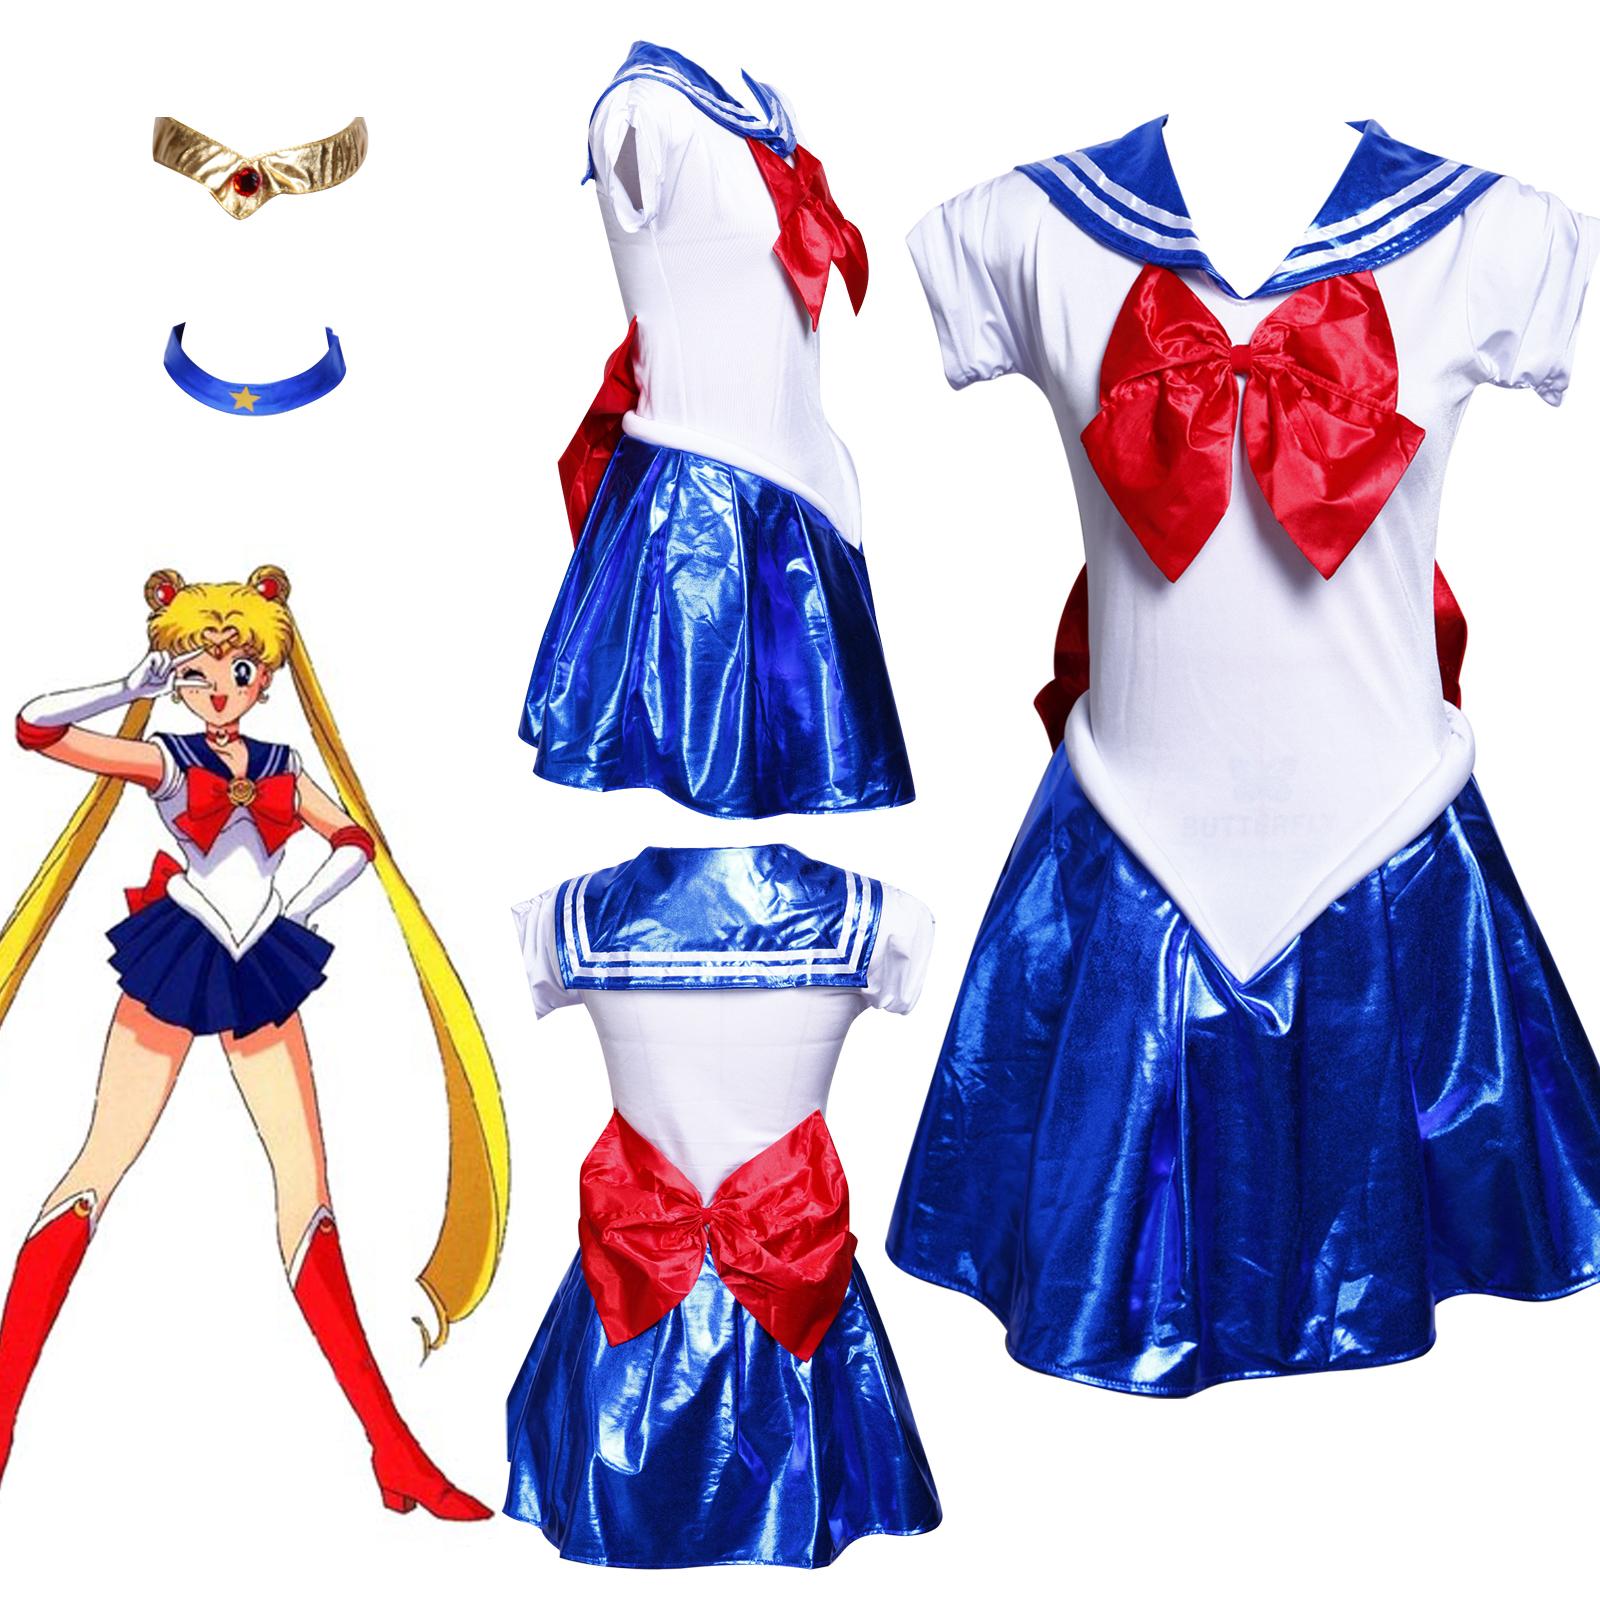 sailormoon sailor moon venus uranus costume uniform fancy. Black Bedroom Furniture Sets. Home Design Ideas